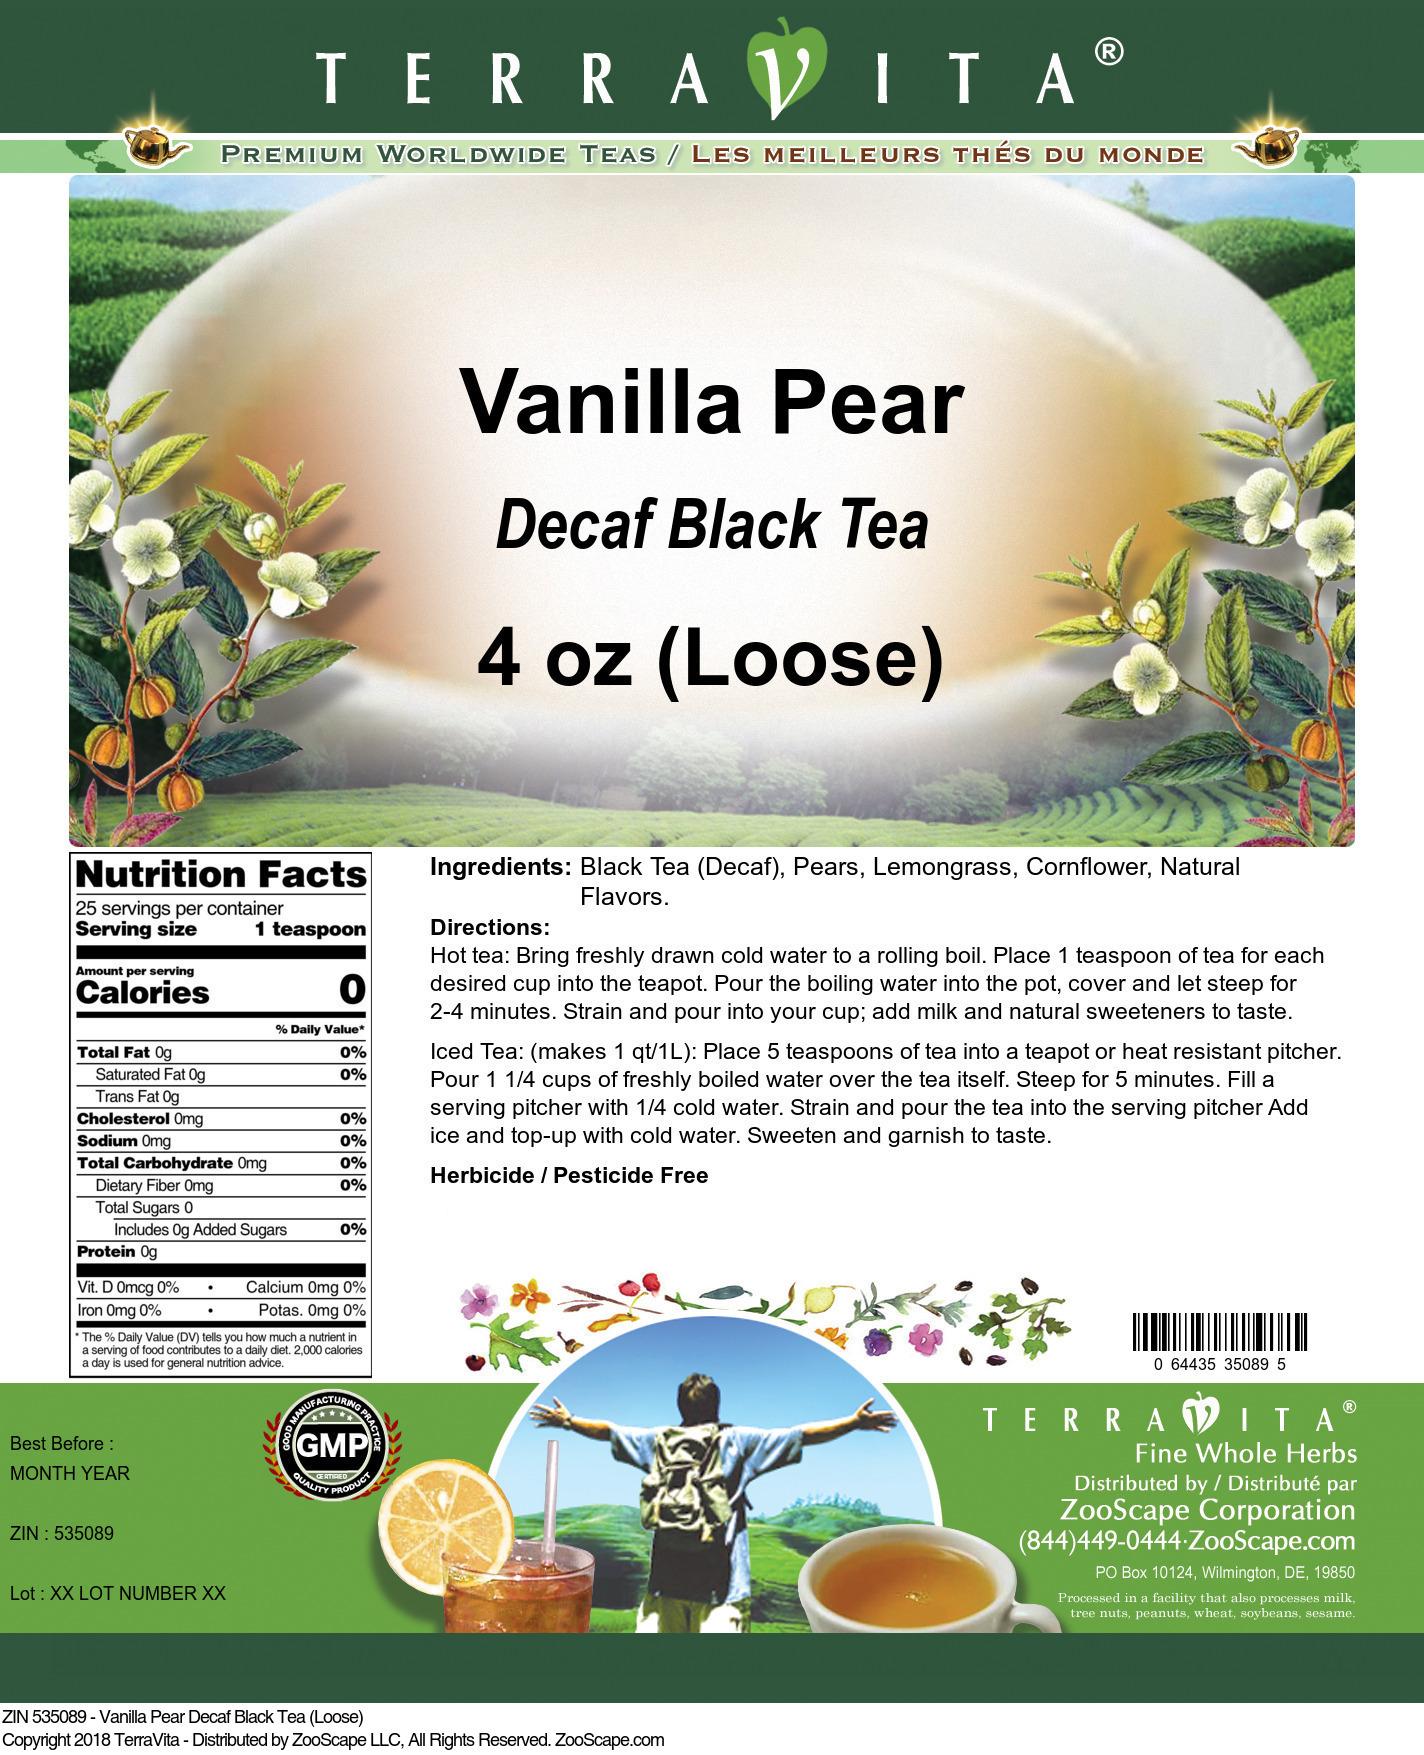 Vanilla Pear Decaf Black Tea (Loose)